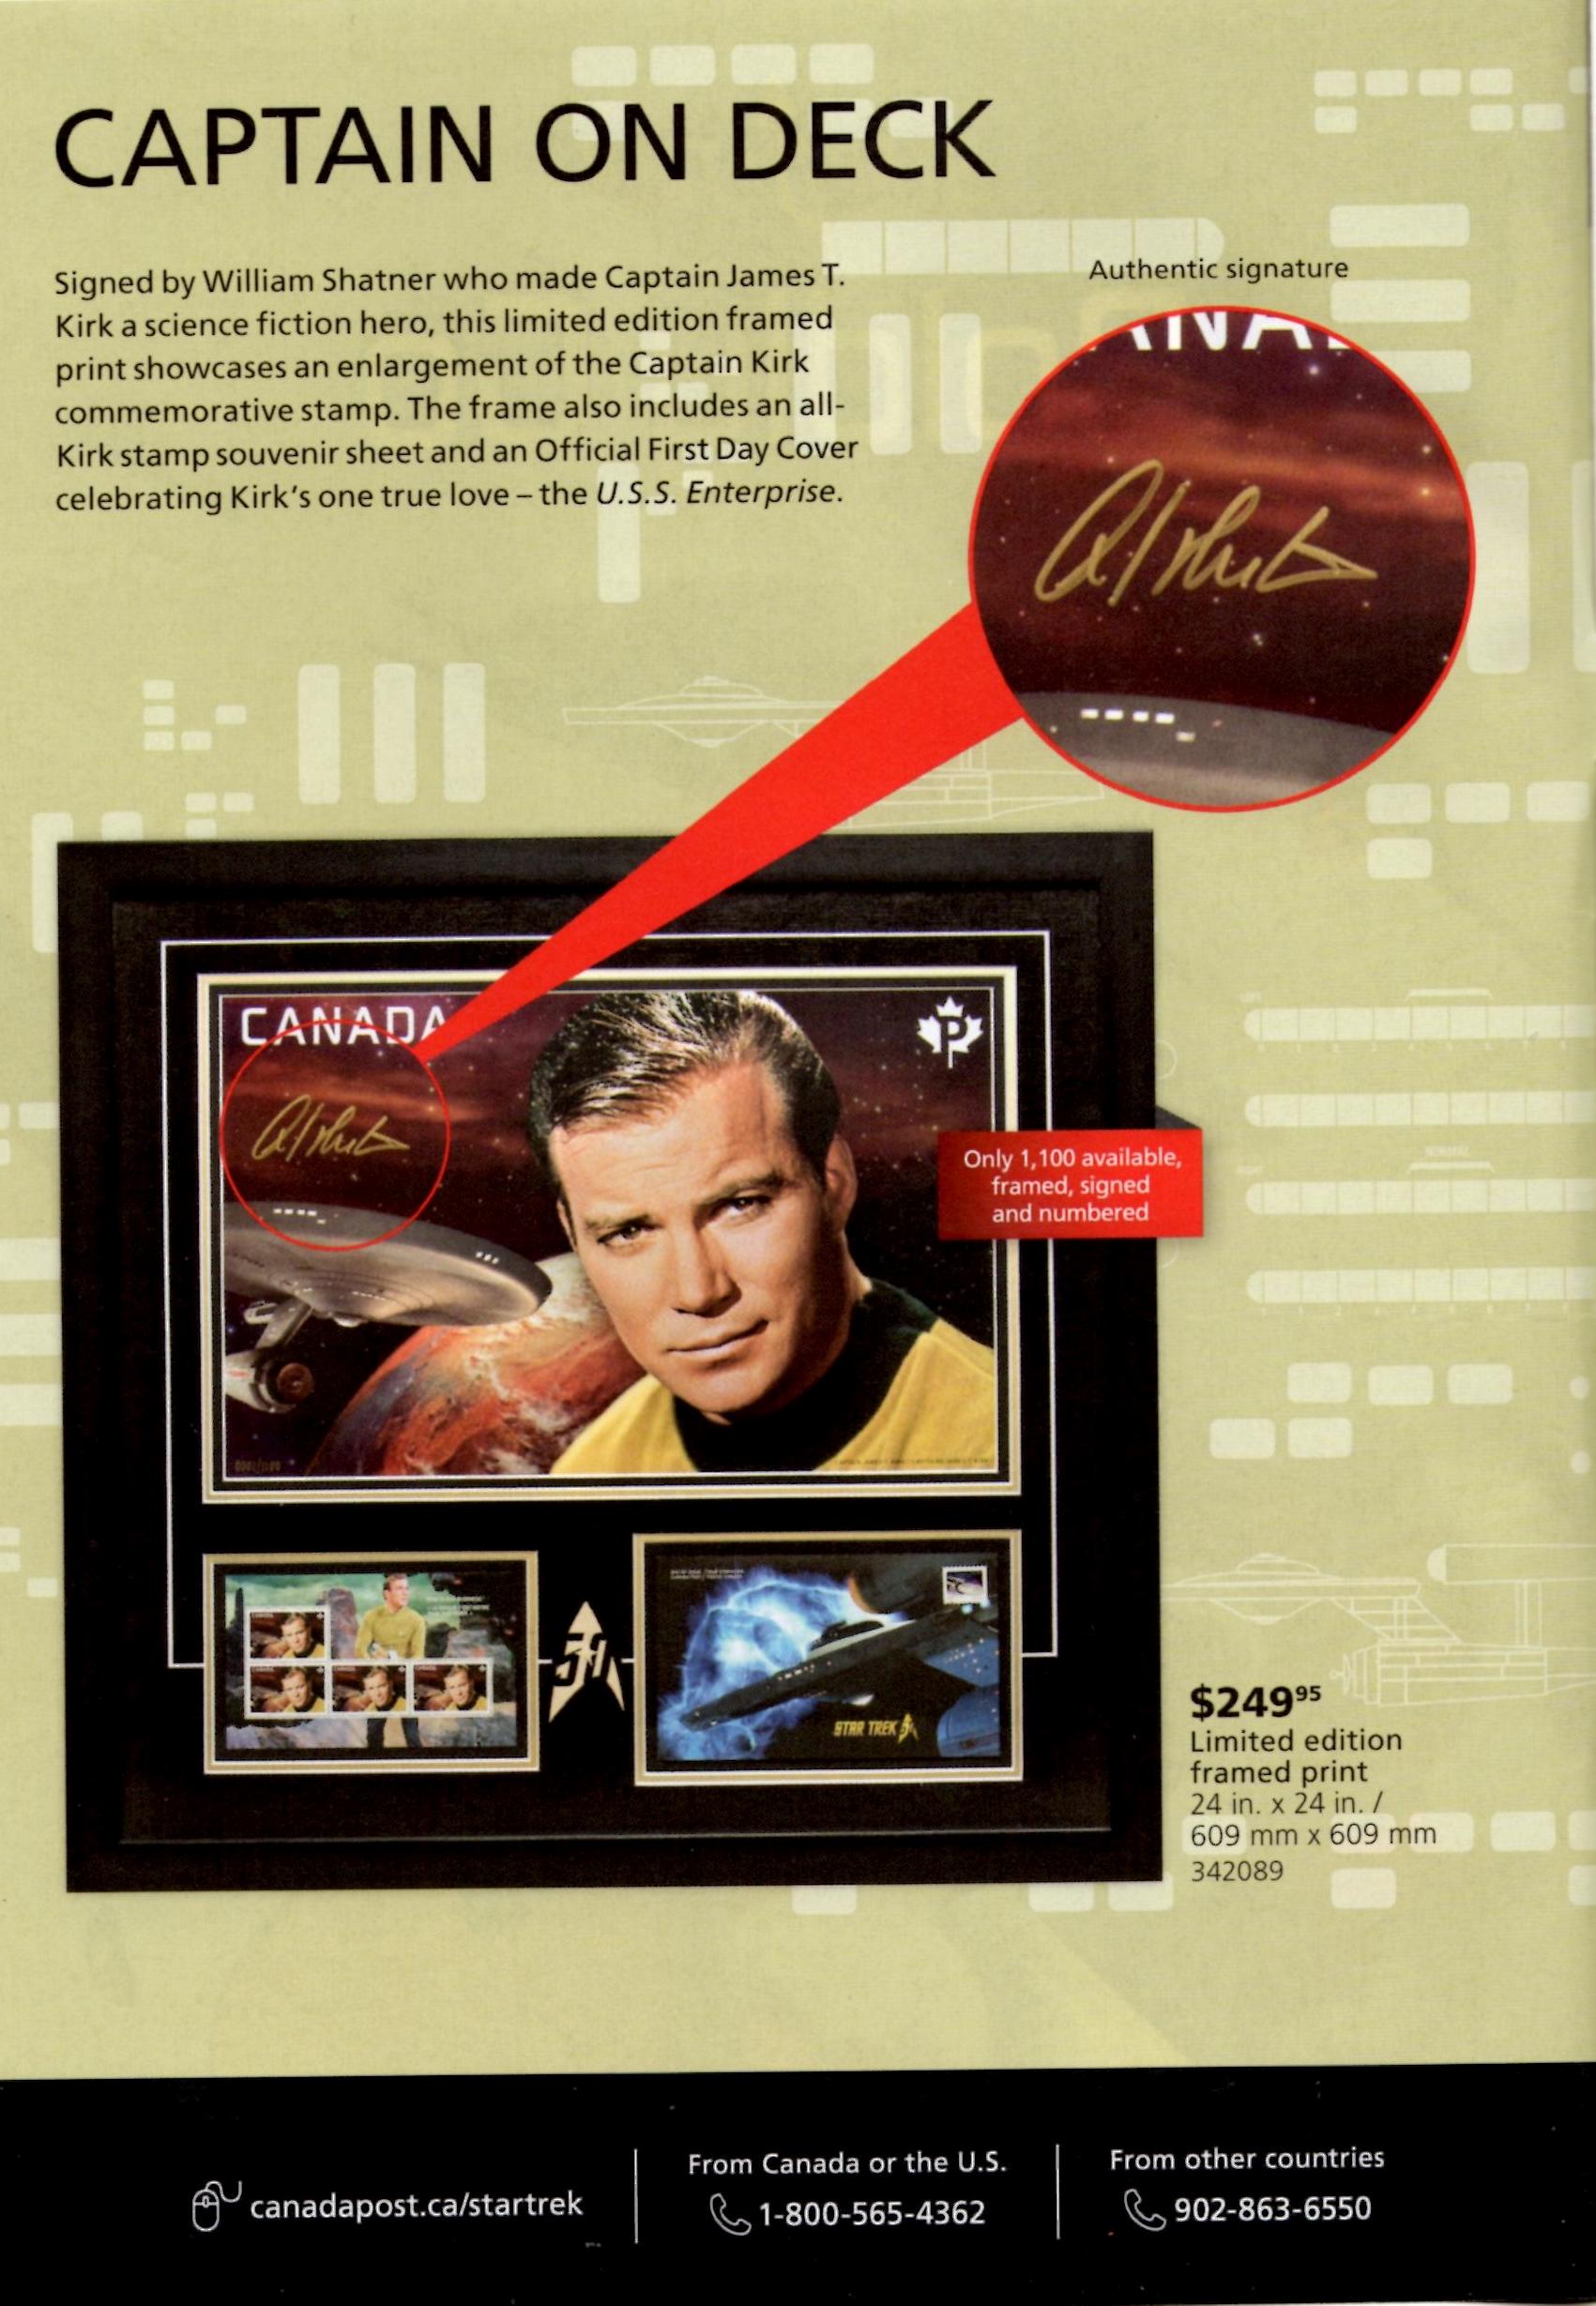 2016 Canada Post framed Kirk print.jpg